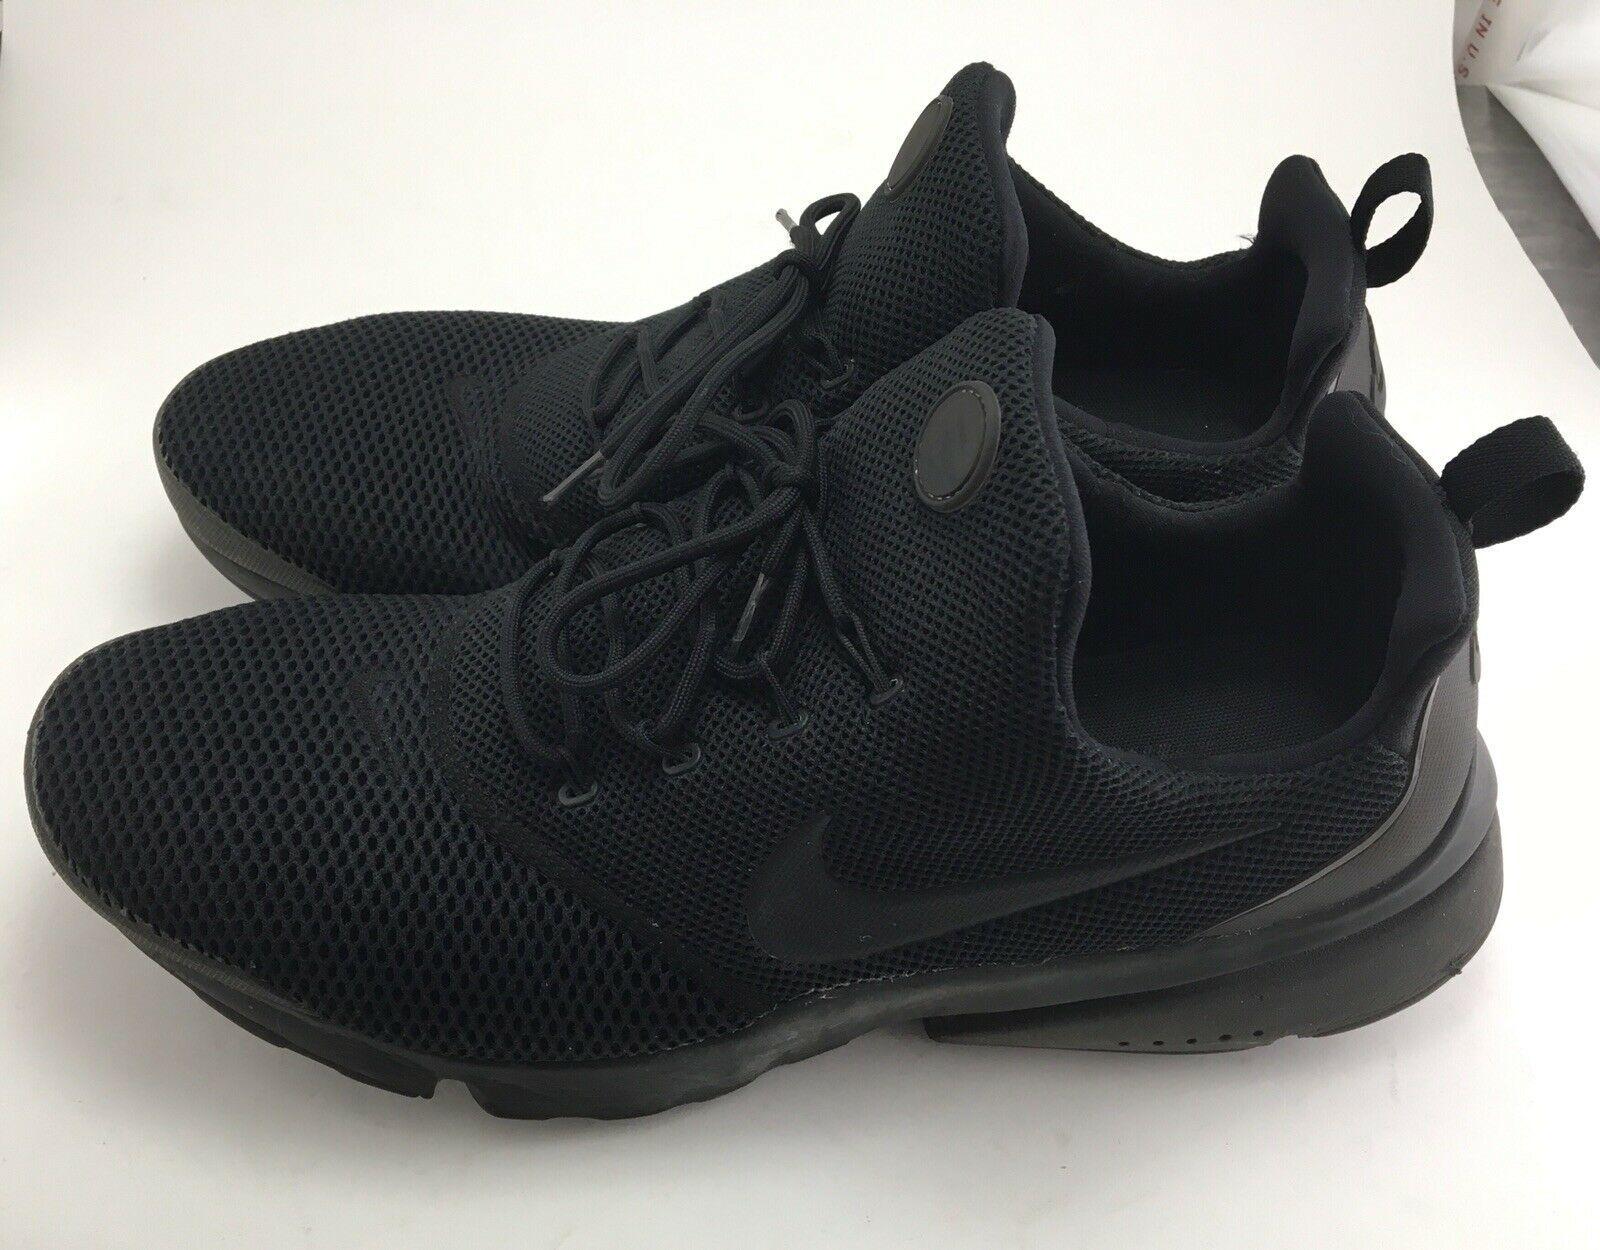 Nike 908019-001 Black Canvas Men's Sneaker Size 12 U.S. Comfort Slip on Lace up